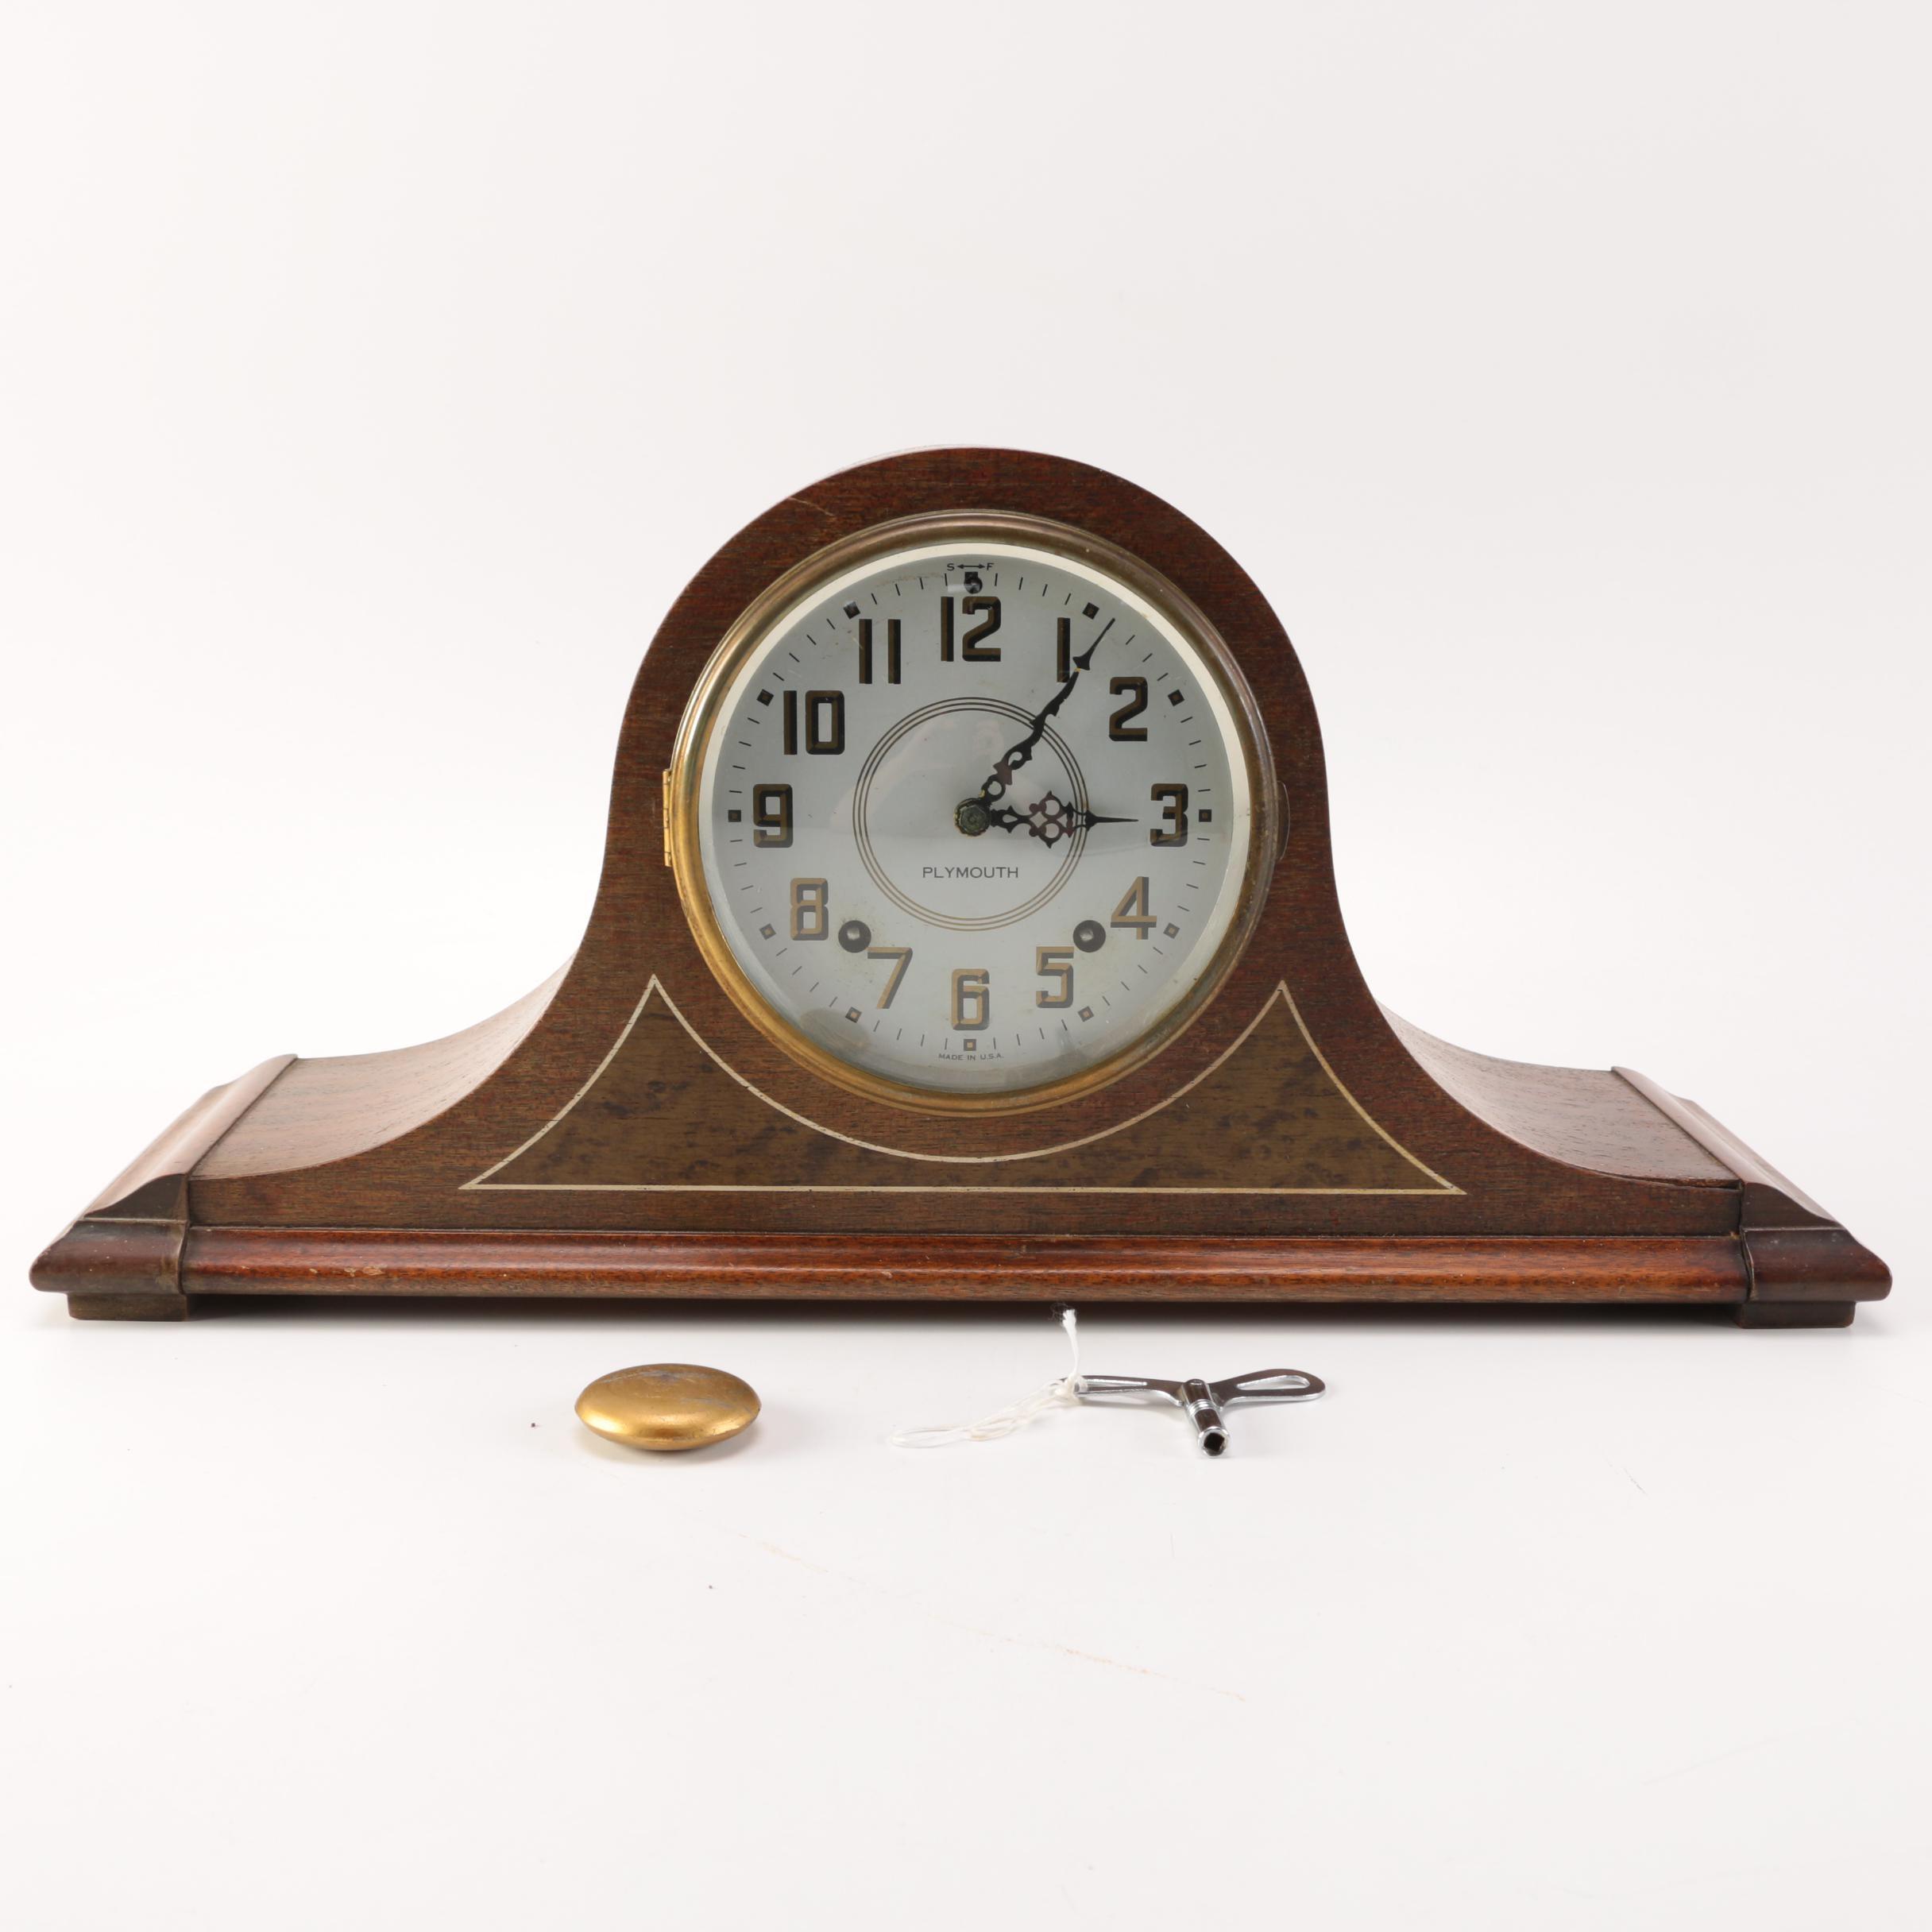 Vintage Thomas-Plymouth Mantel Clock